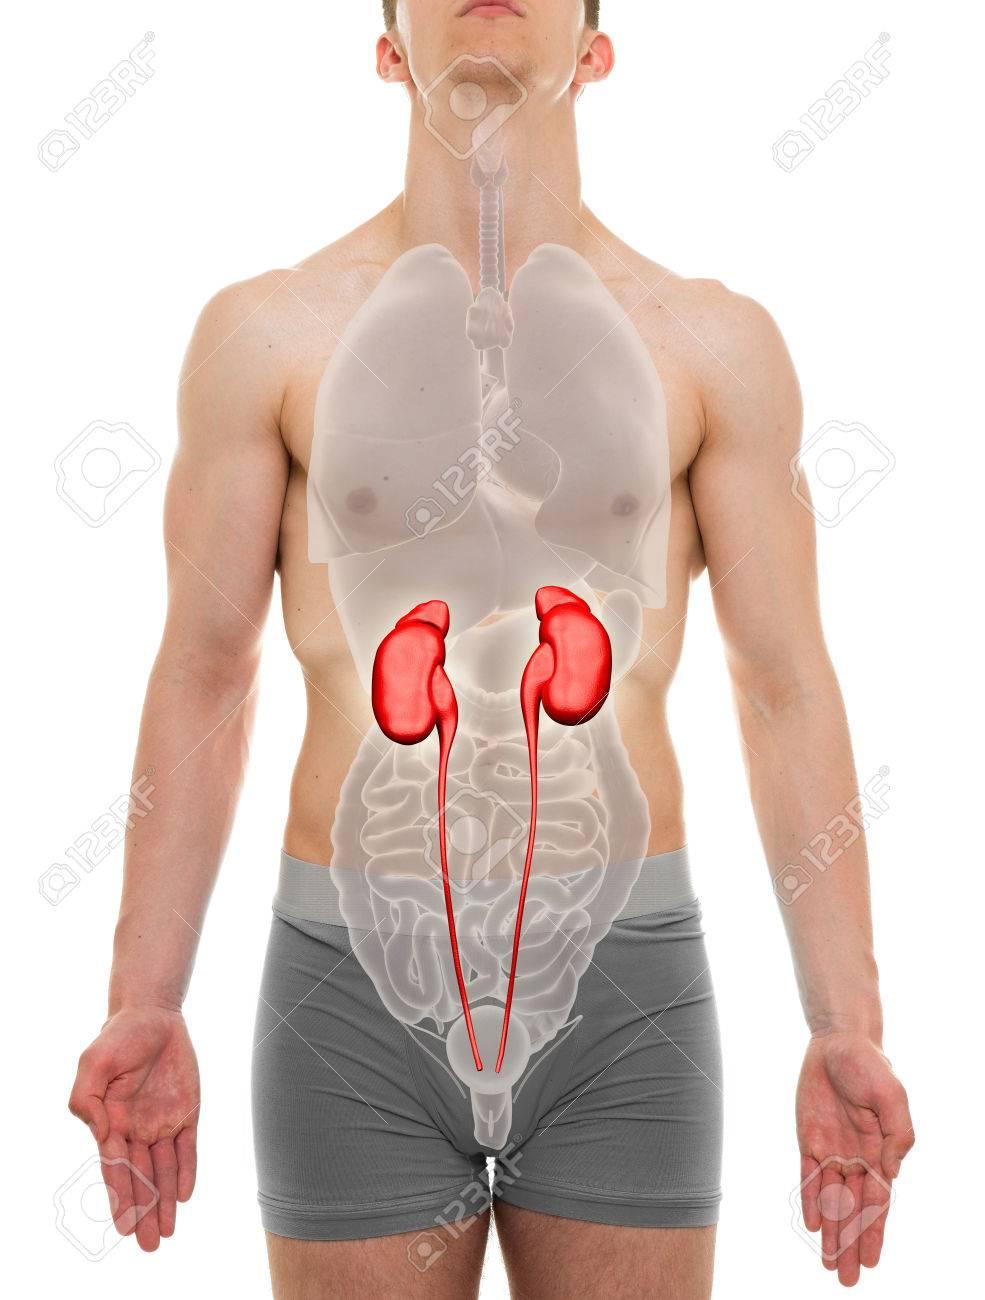 Kidneys Male - Internal Organs Anatomy - 3D Illustration Stock Photo ...